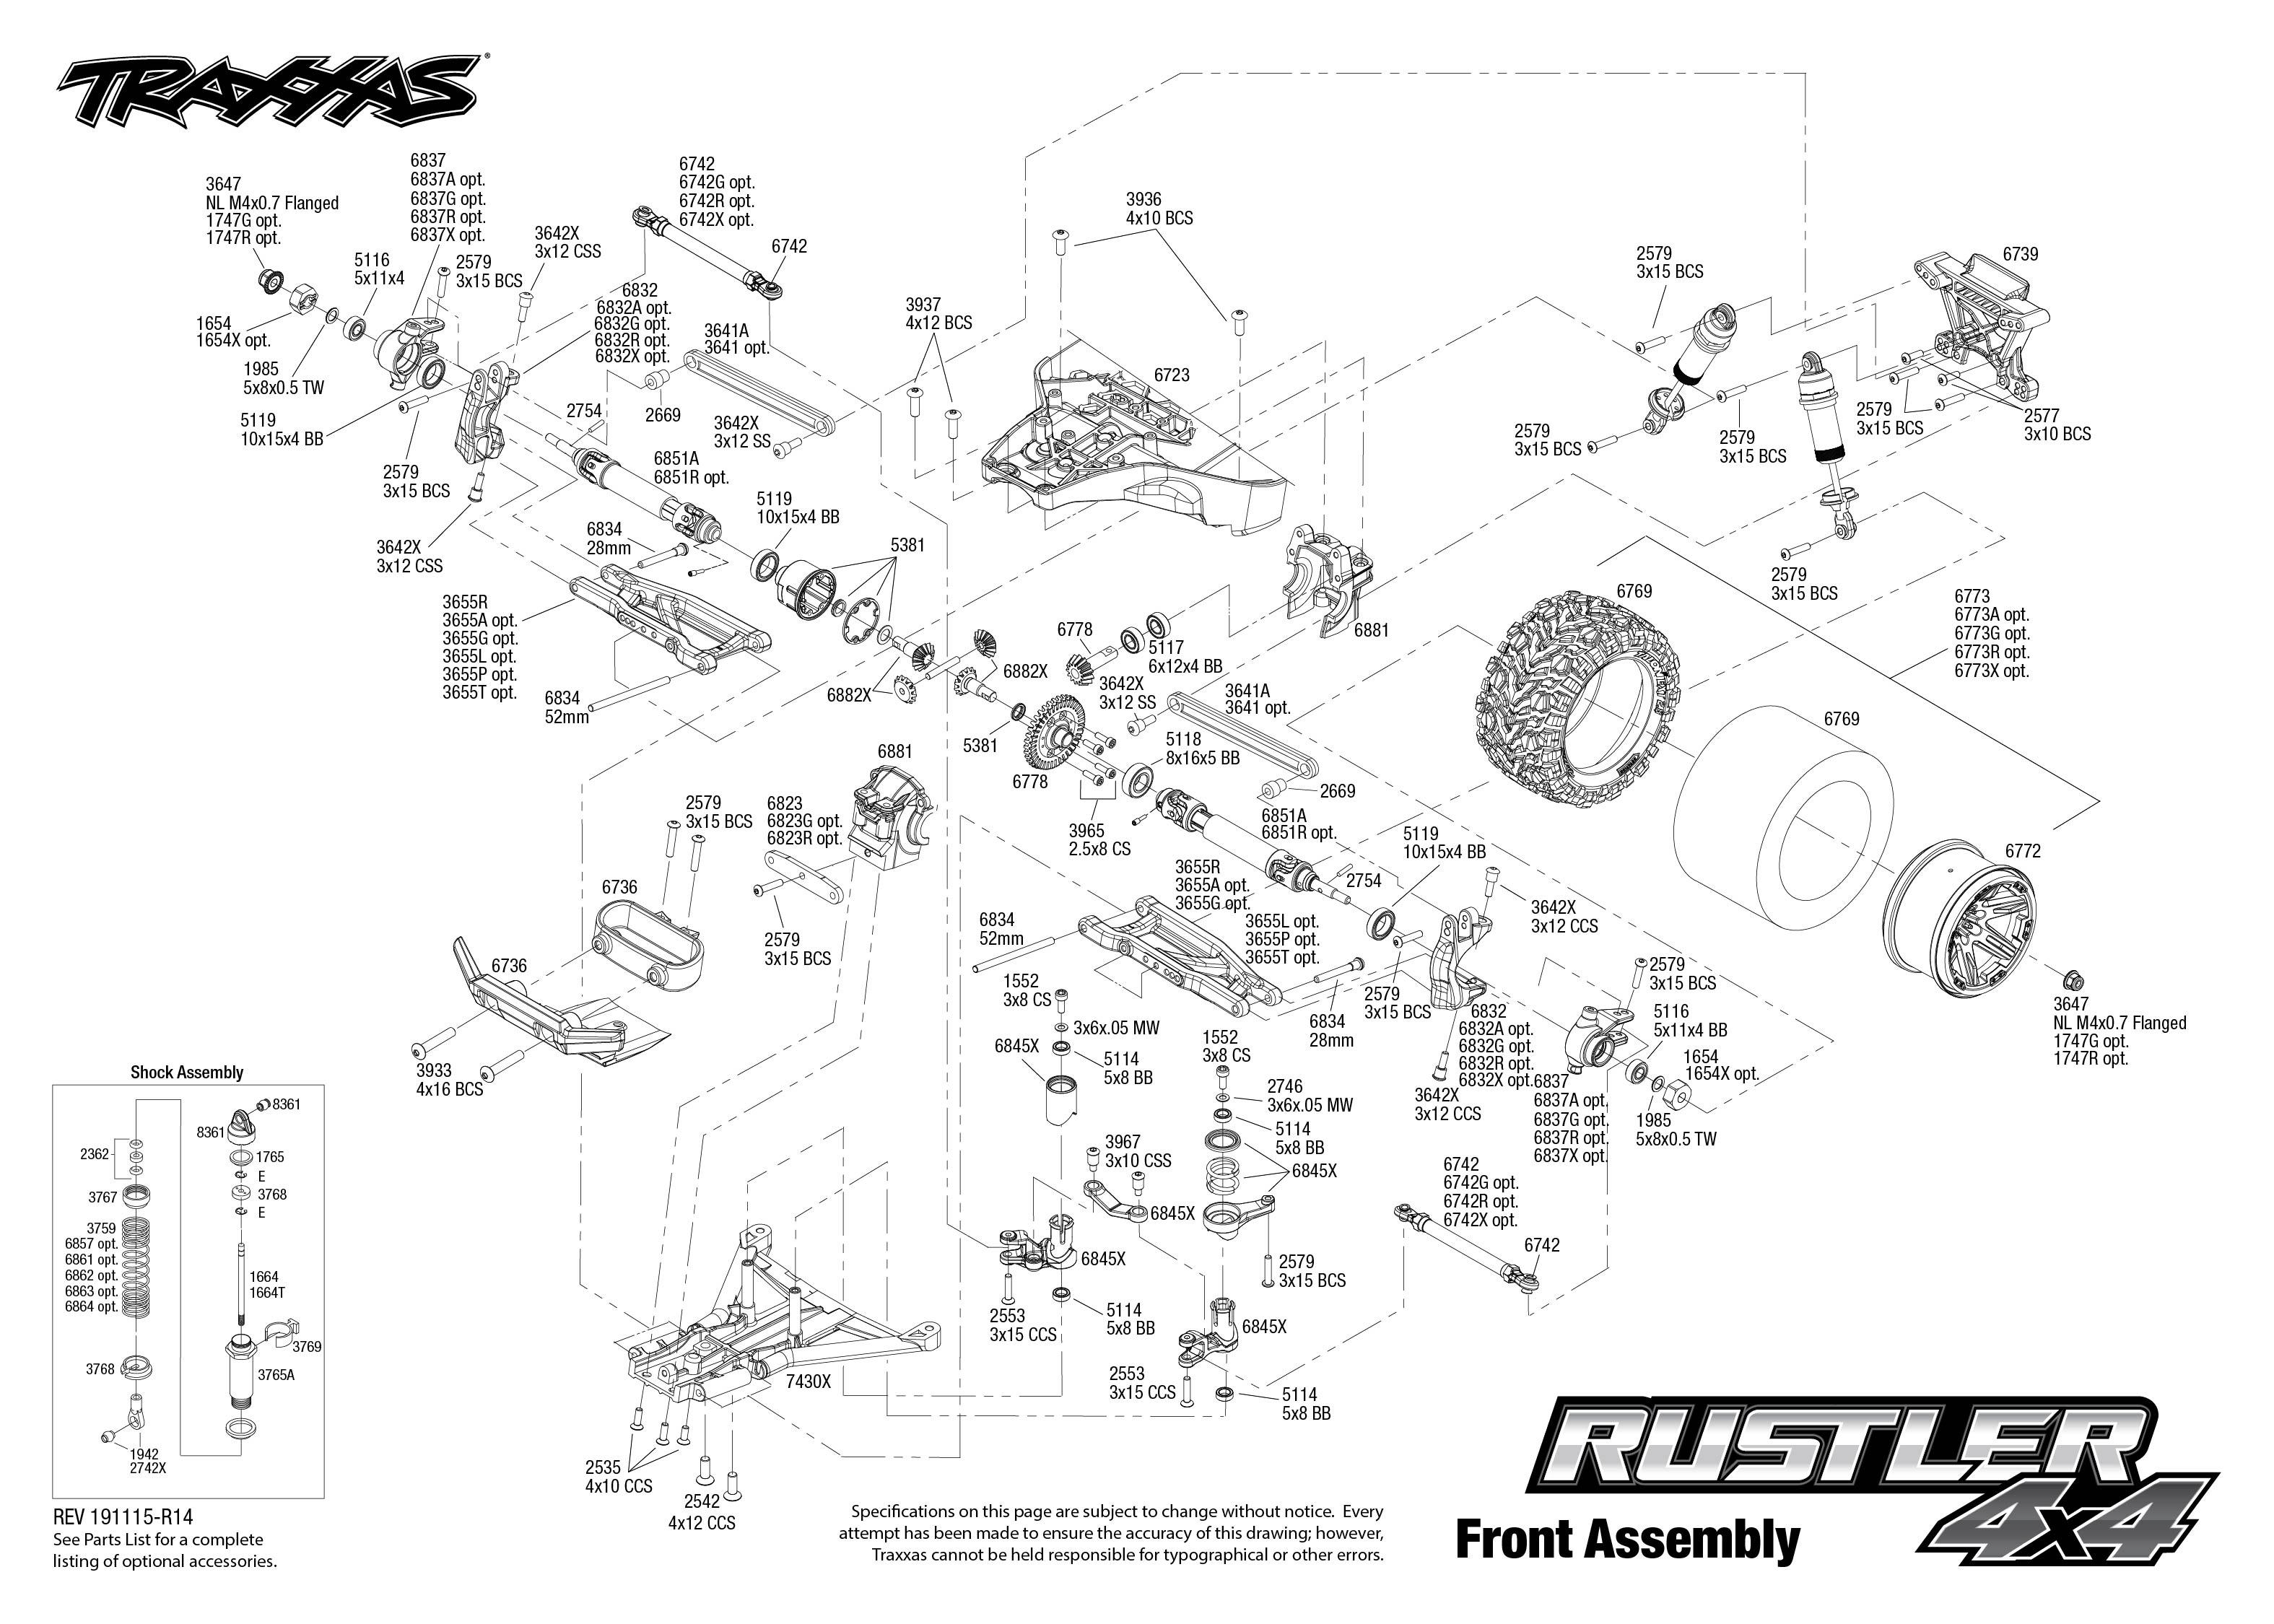 Traxxas Rustler 4X4 1/10 Scale 4WD Brushed Stadium Truck